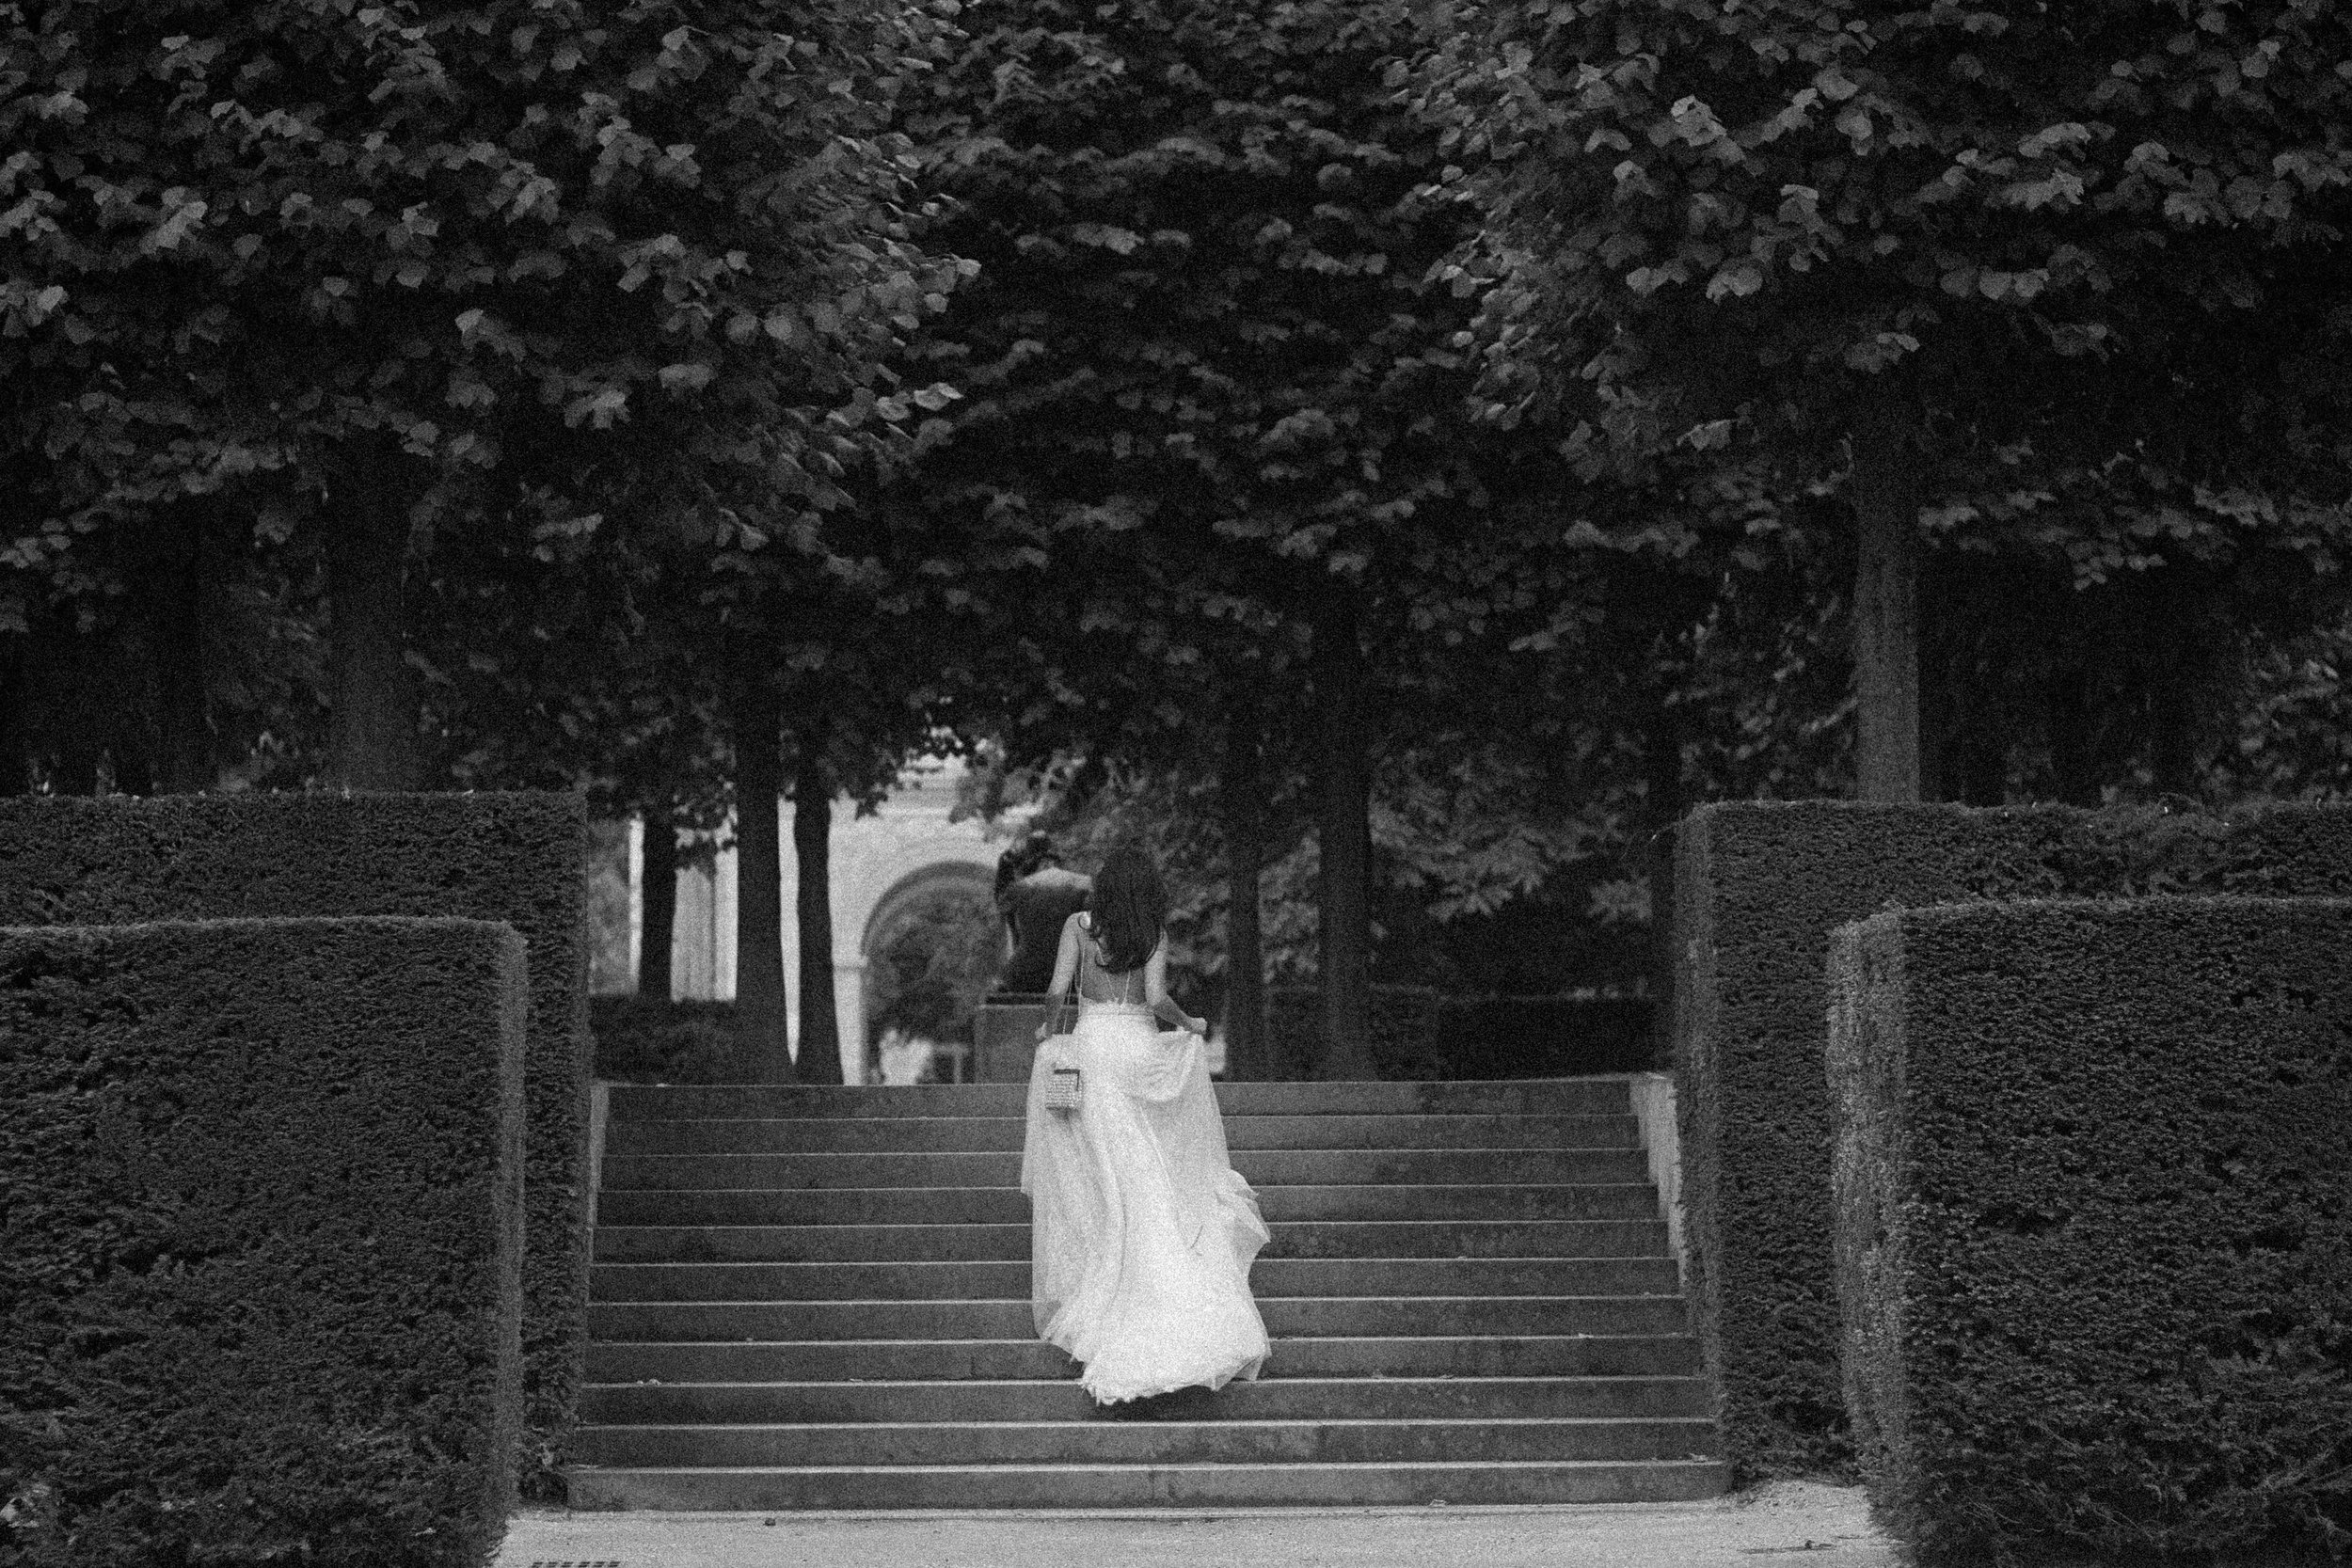 paris wedding photographer craig george hannah and mitch elopment-128.jpg